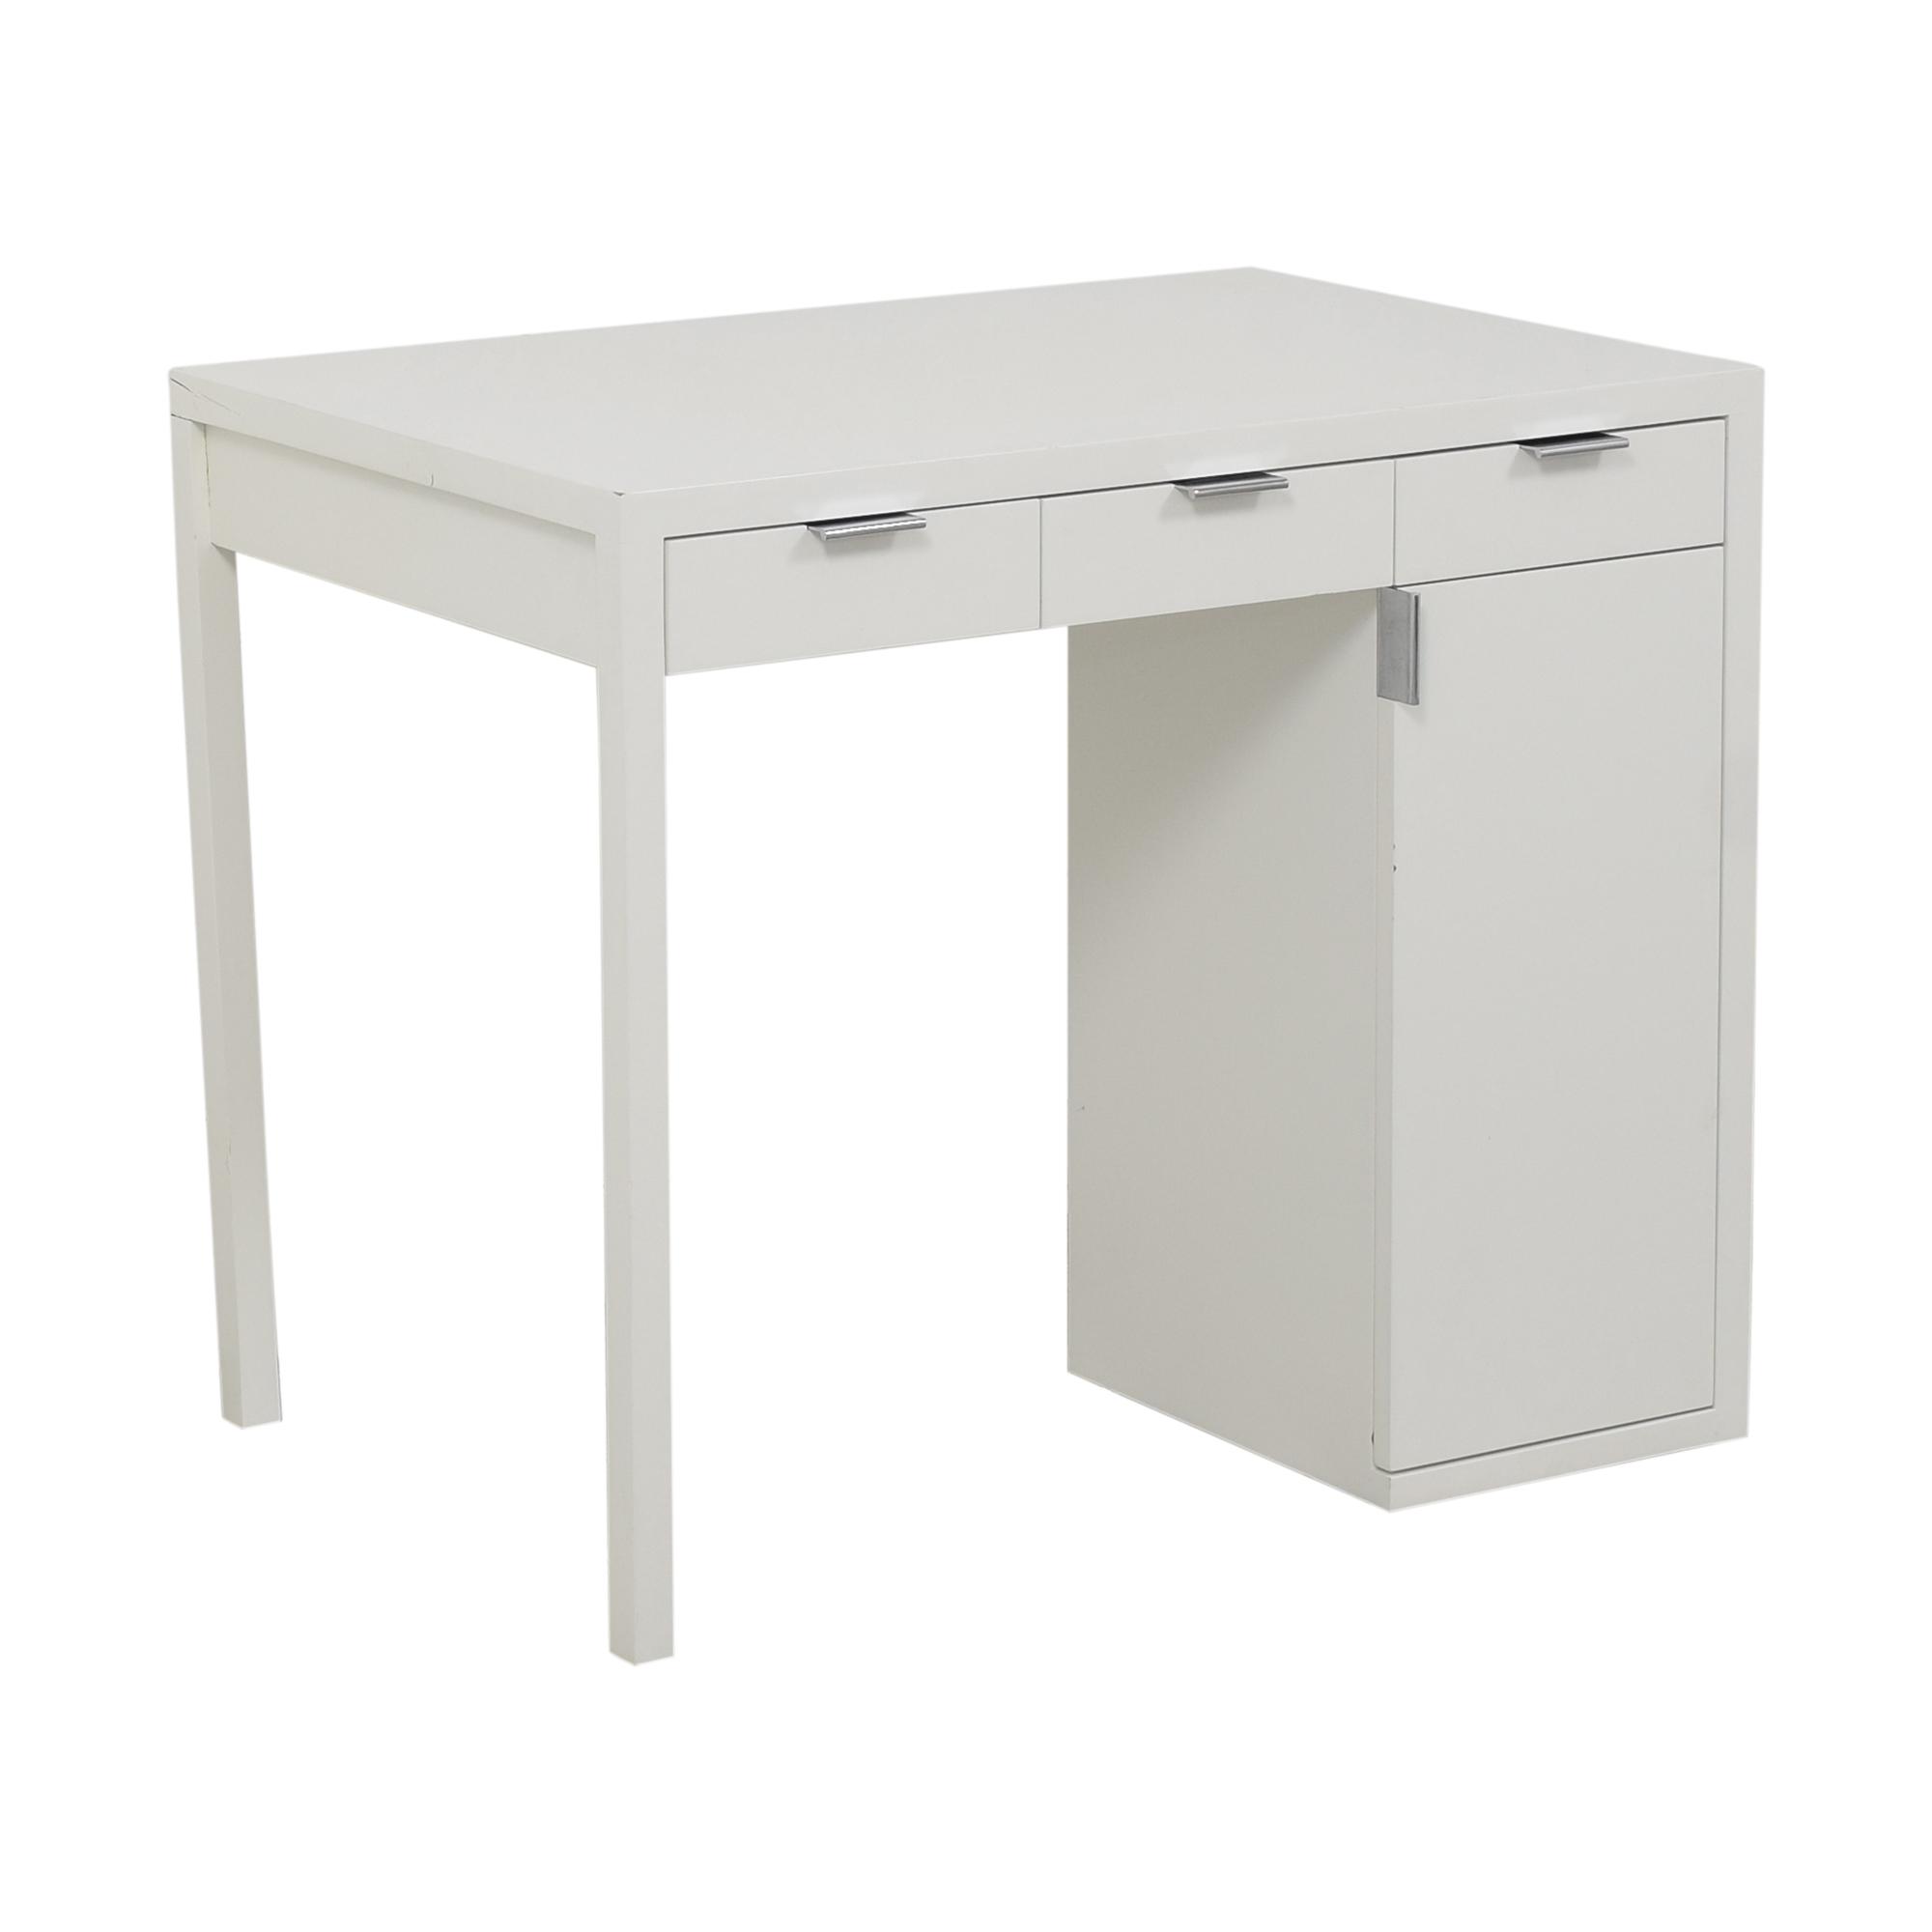 Custom Desk with Storage